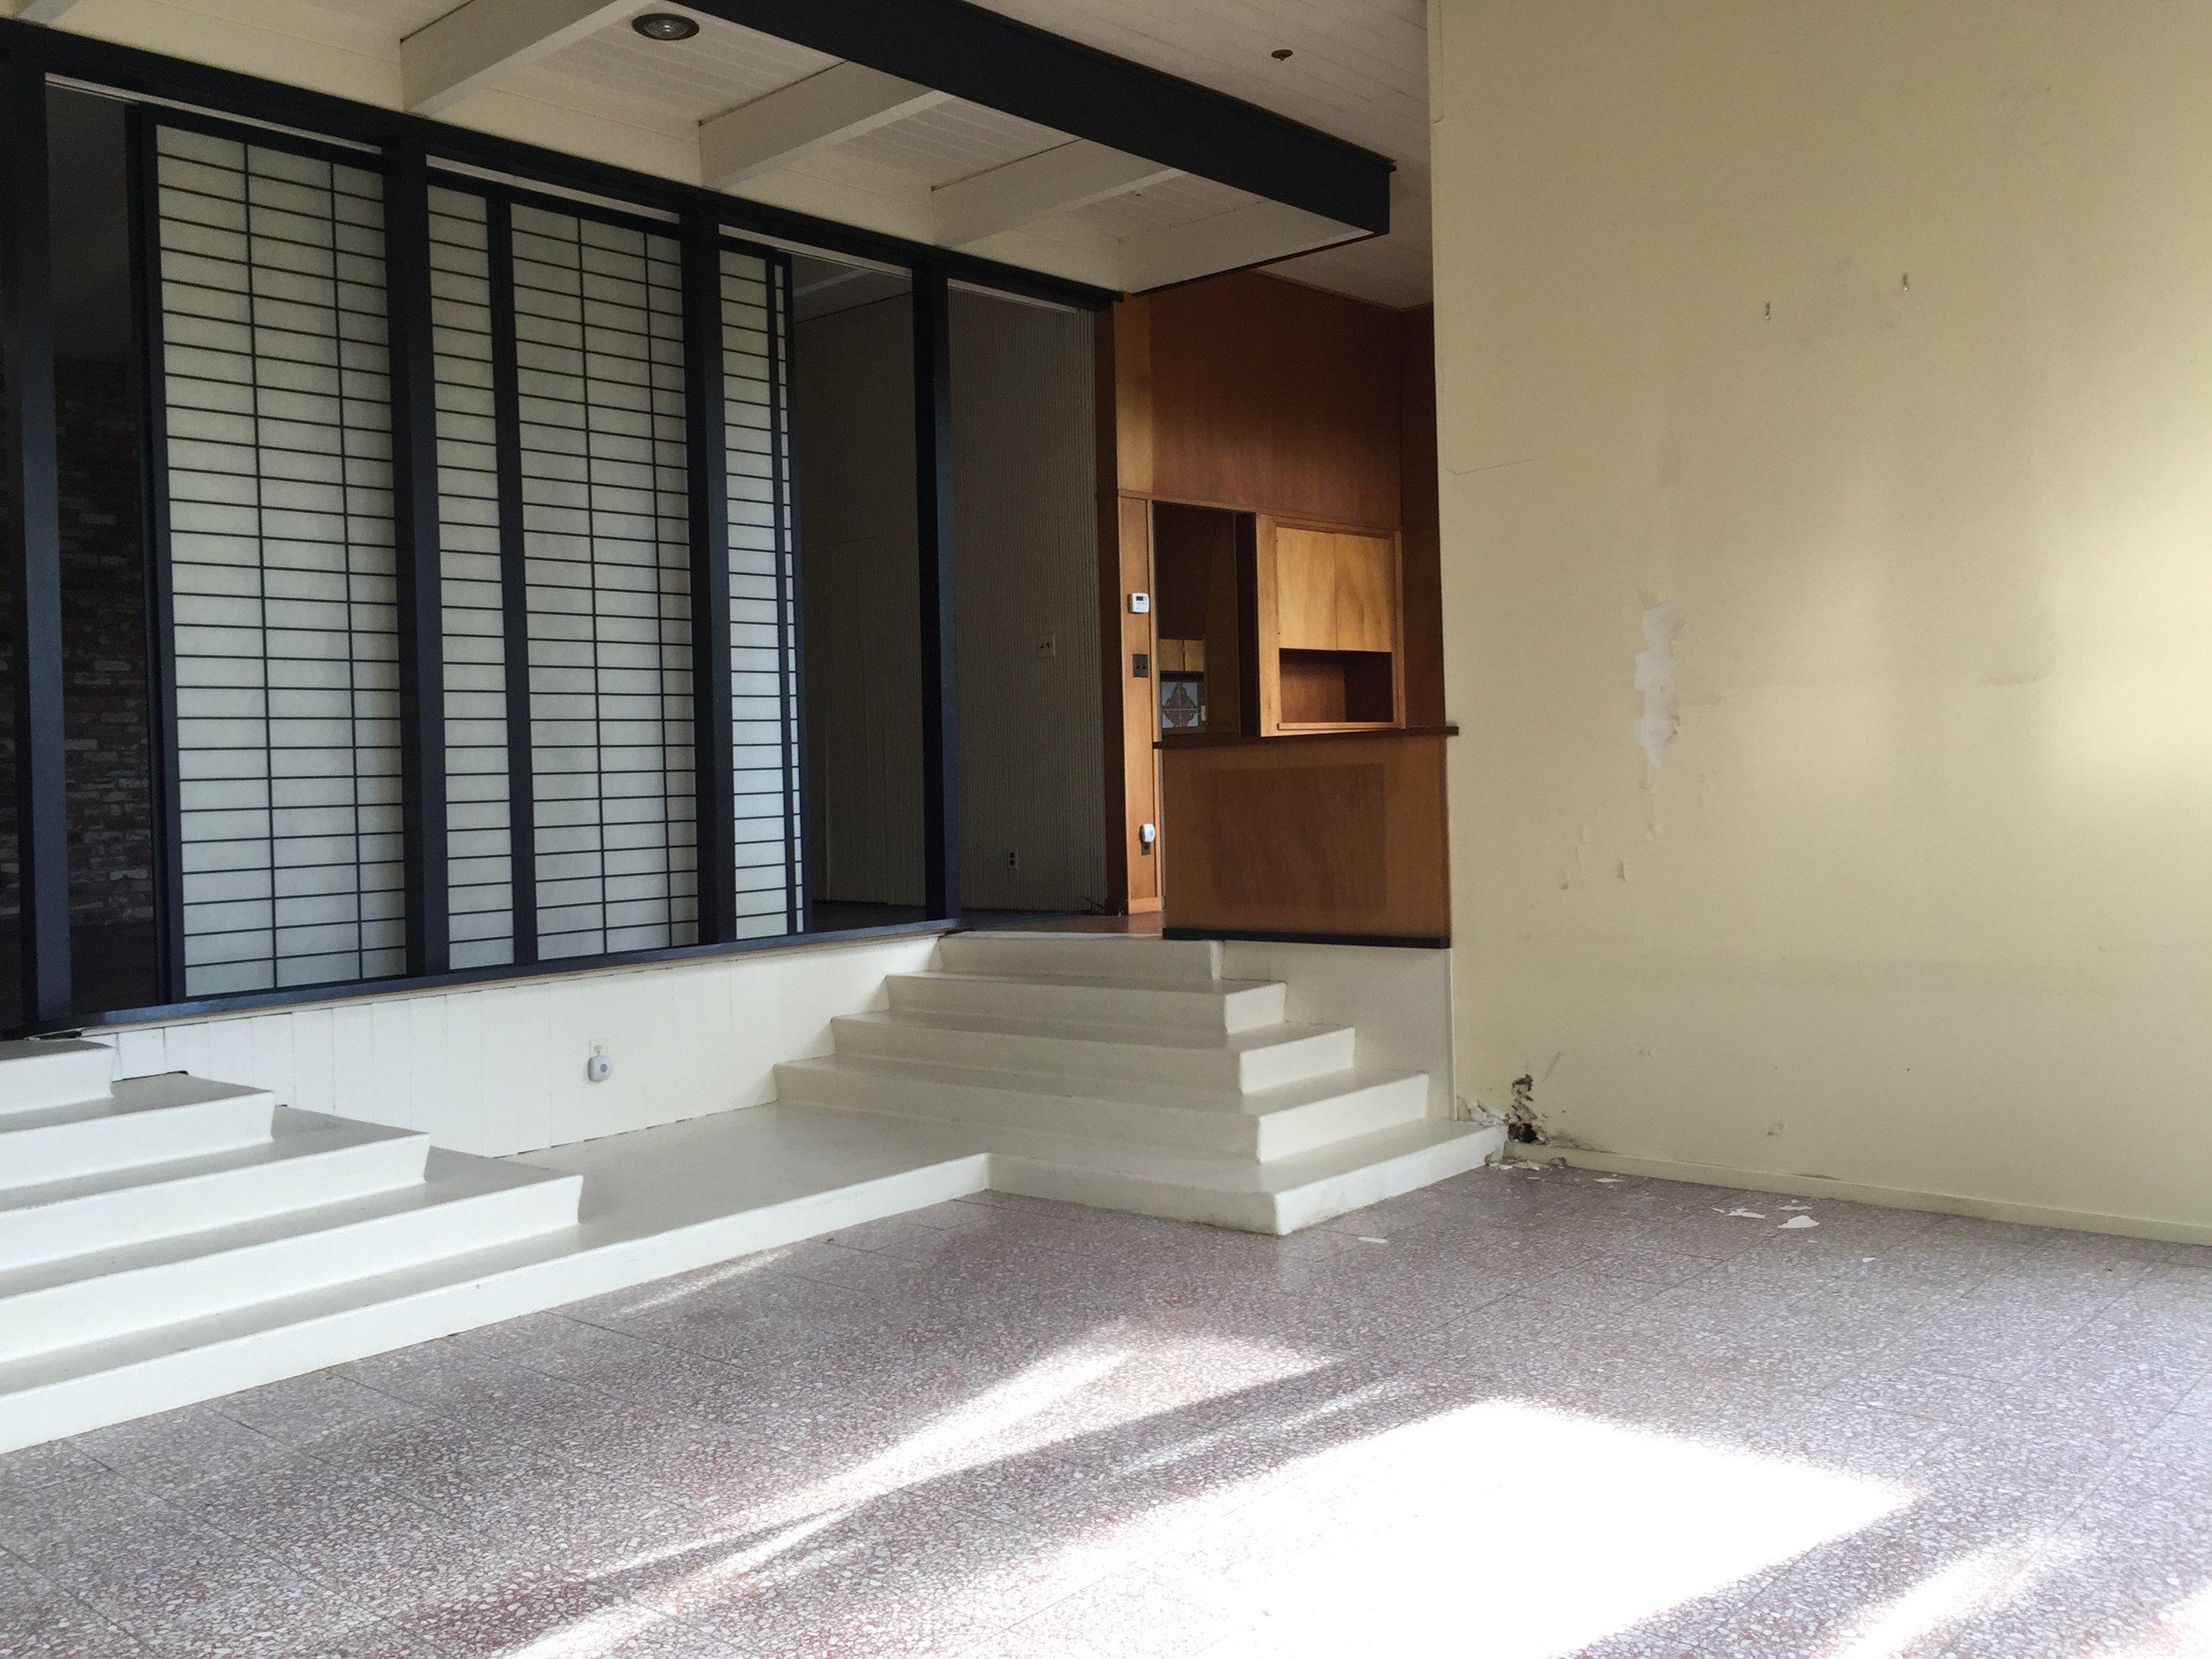 44 Tarry Lane, Orinda. Sitting Room: Before